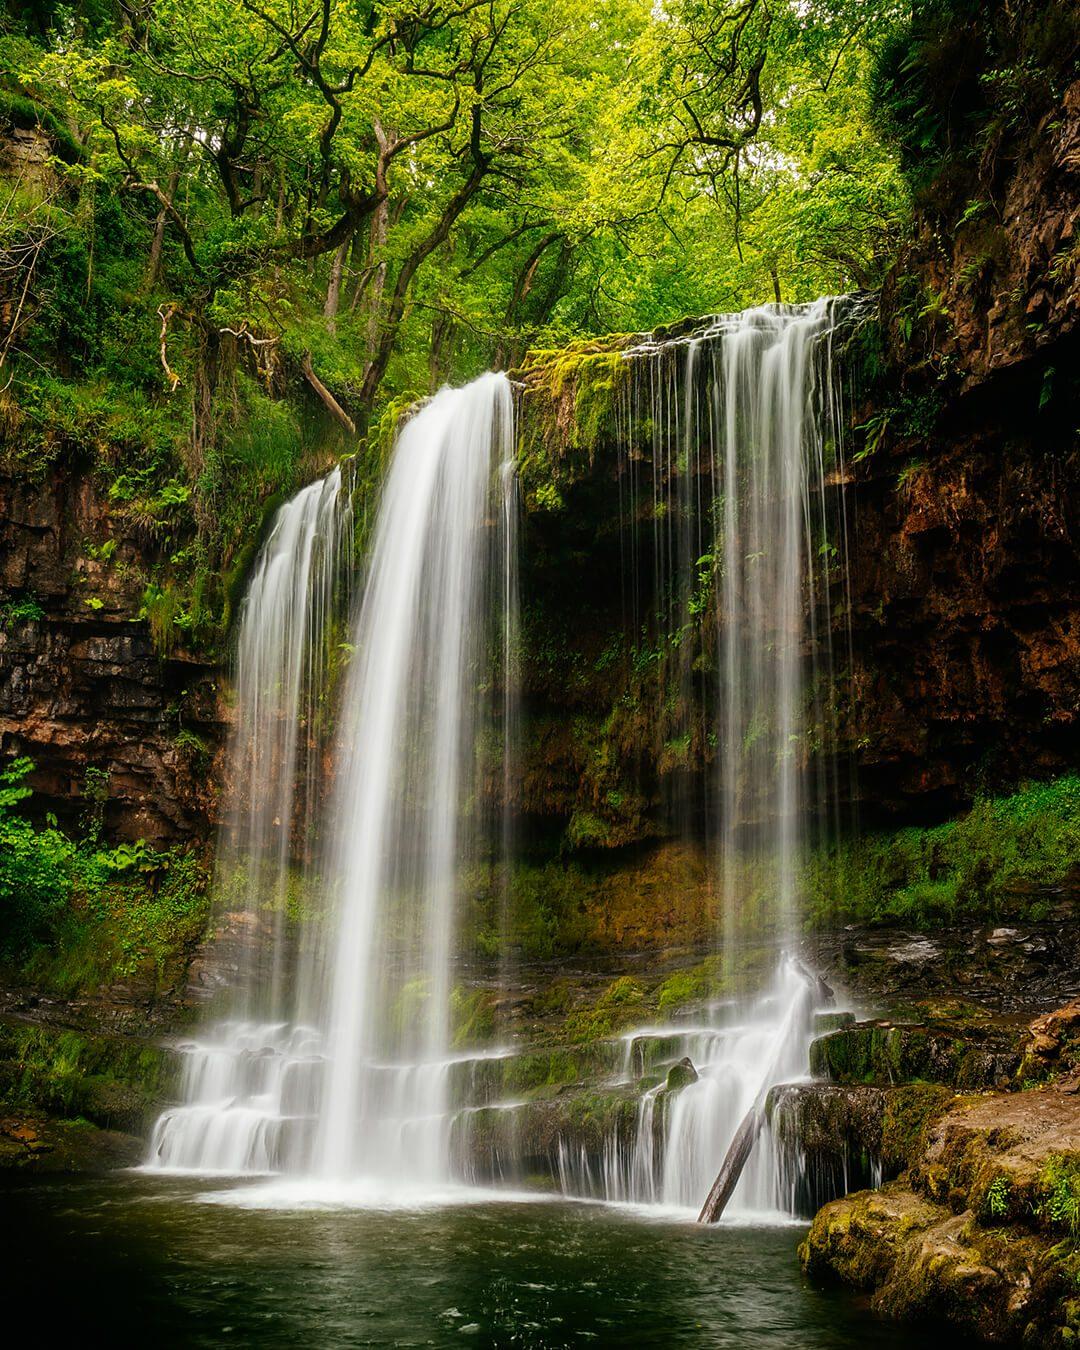 The Snow Waterfall